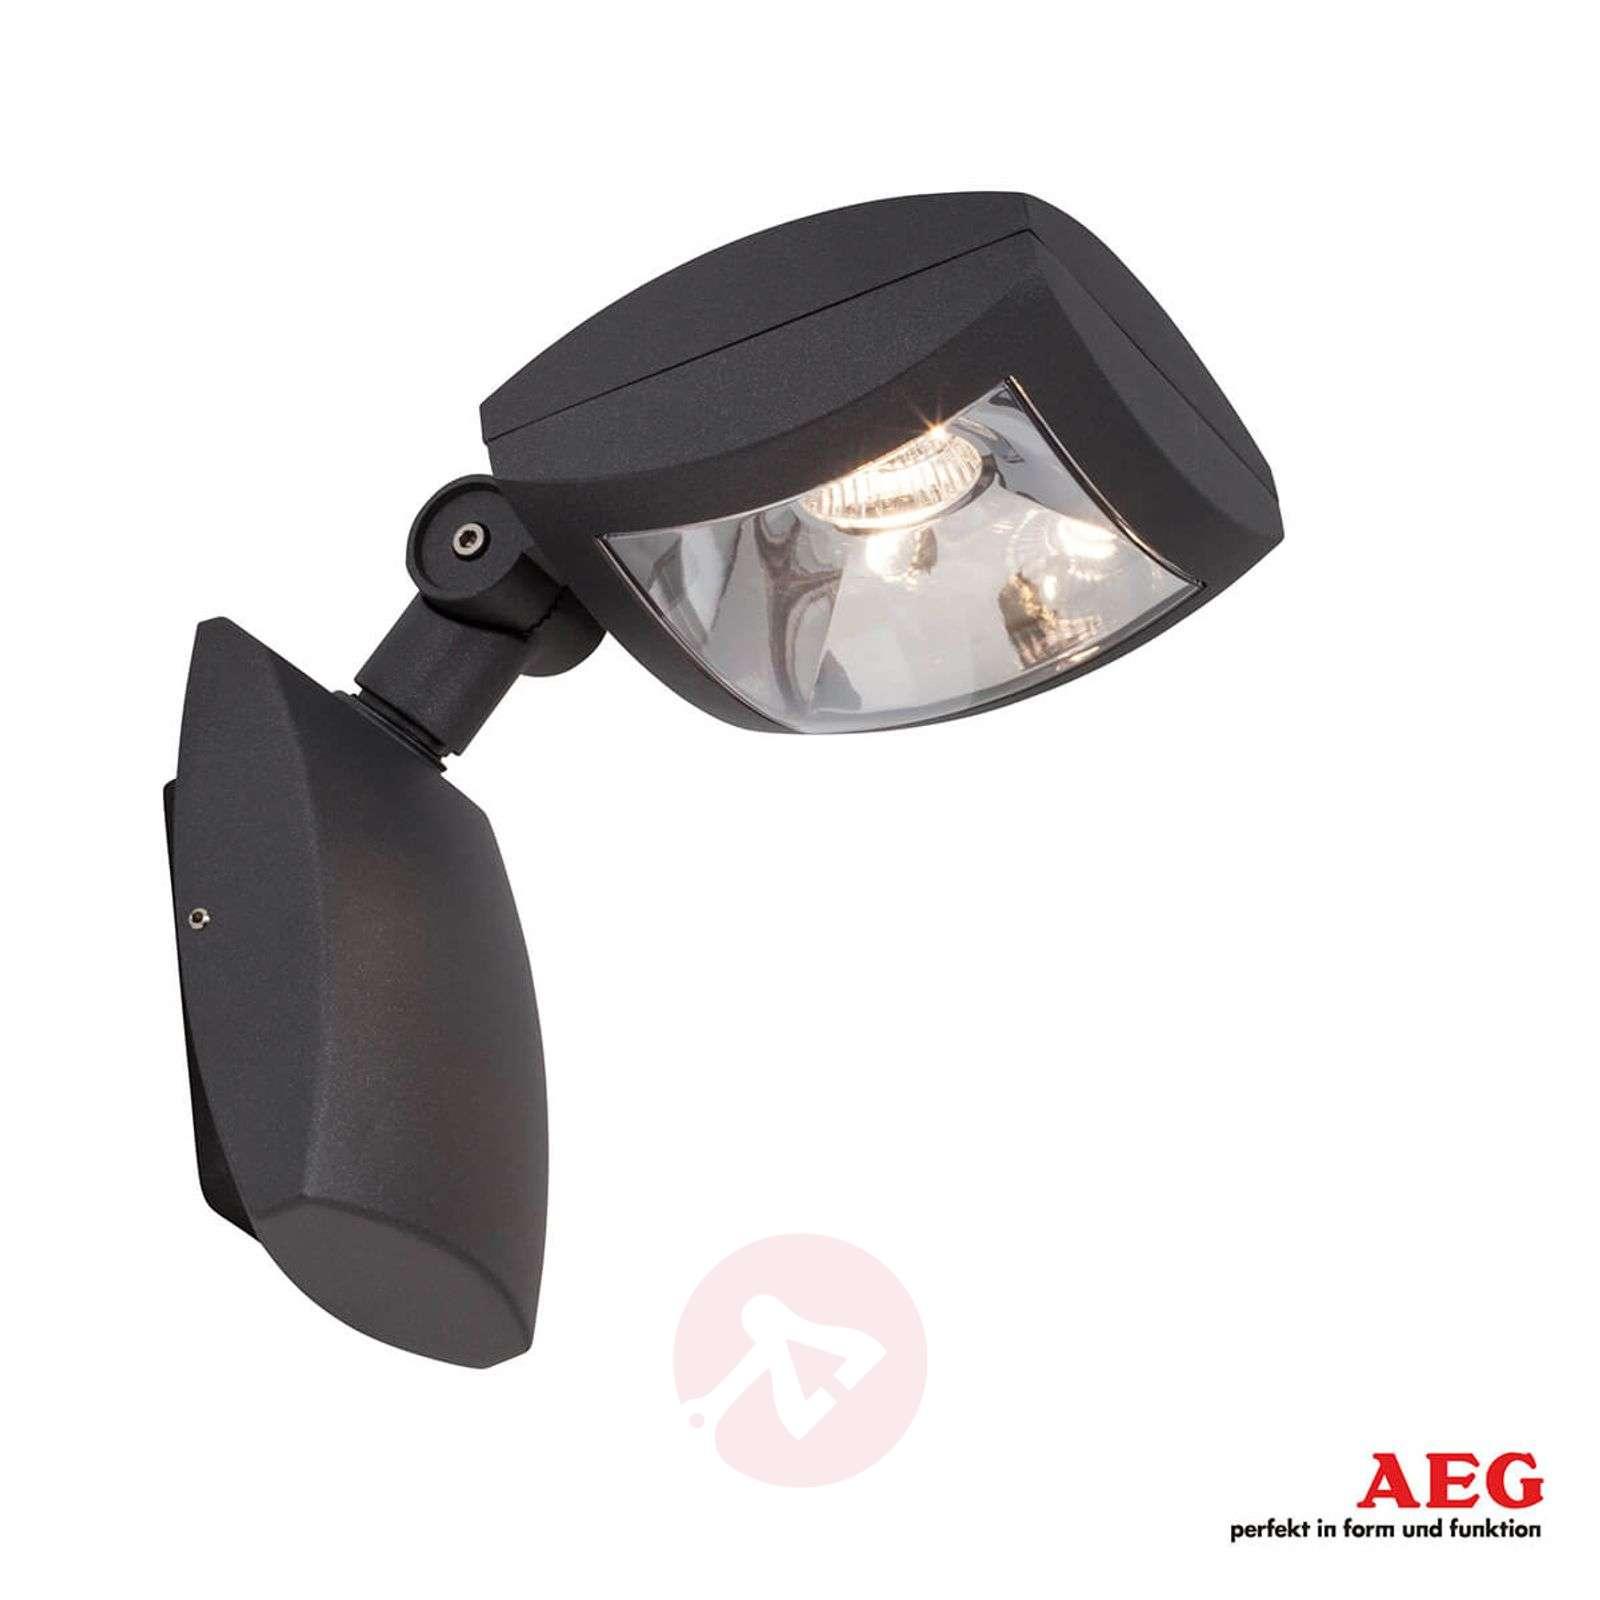 AEG Guardiano pivotable LED outdoor spotlight-3057138-01